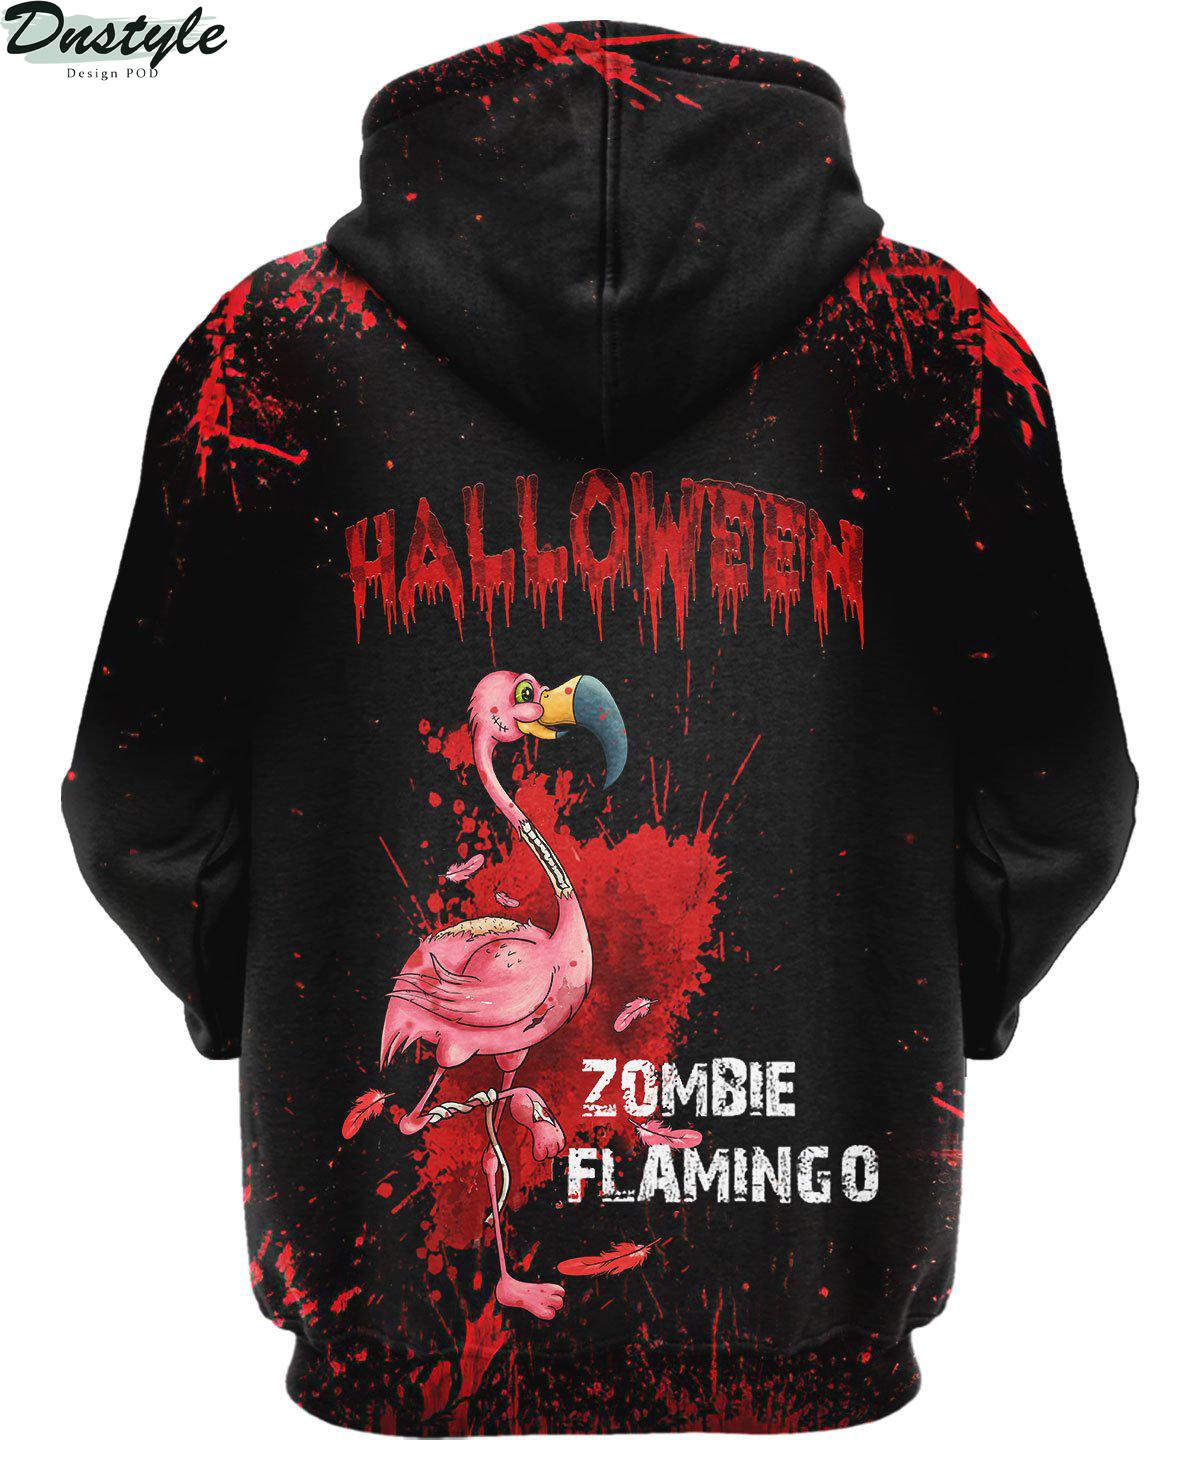 Flamingo Zombie Black Halloween 3d hoodie 1